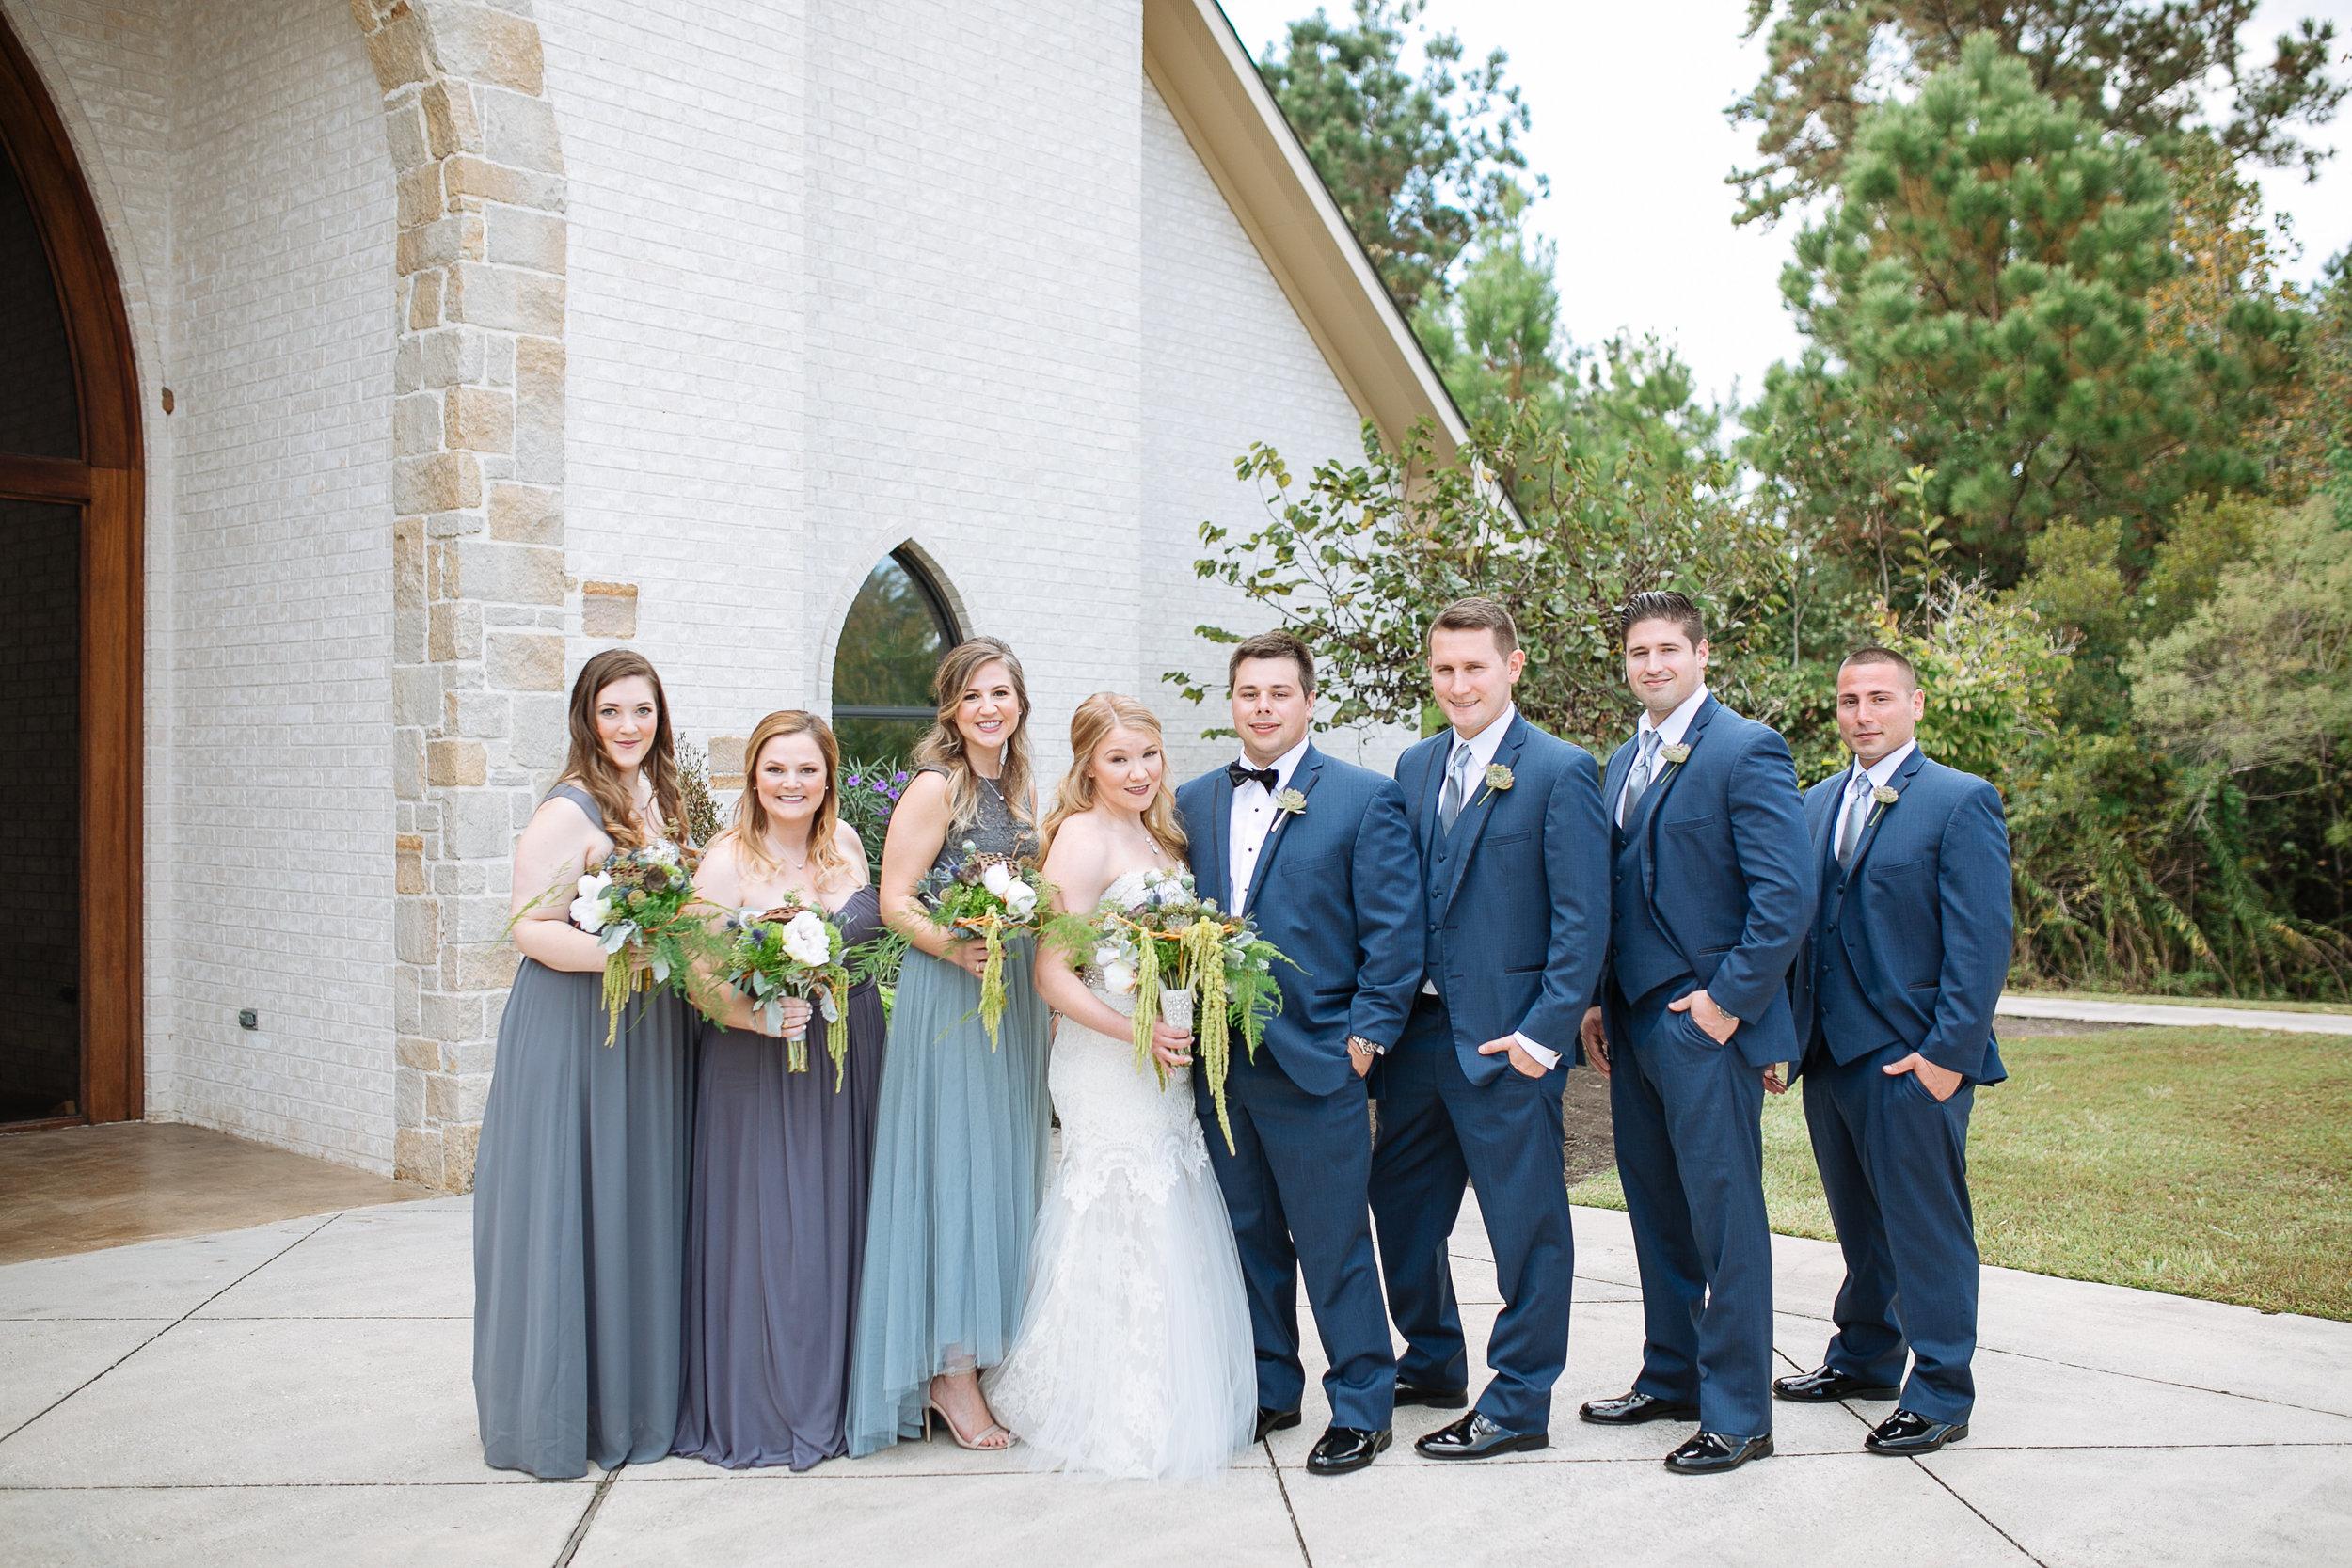 Wedding Party Photos | Blue and Grey Wedding Ideas | Houston Weddings